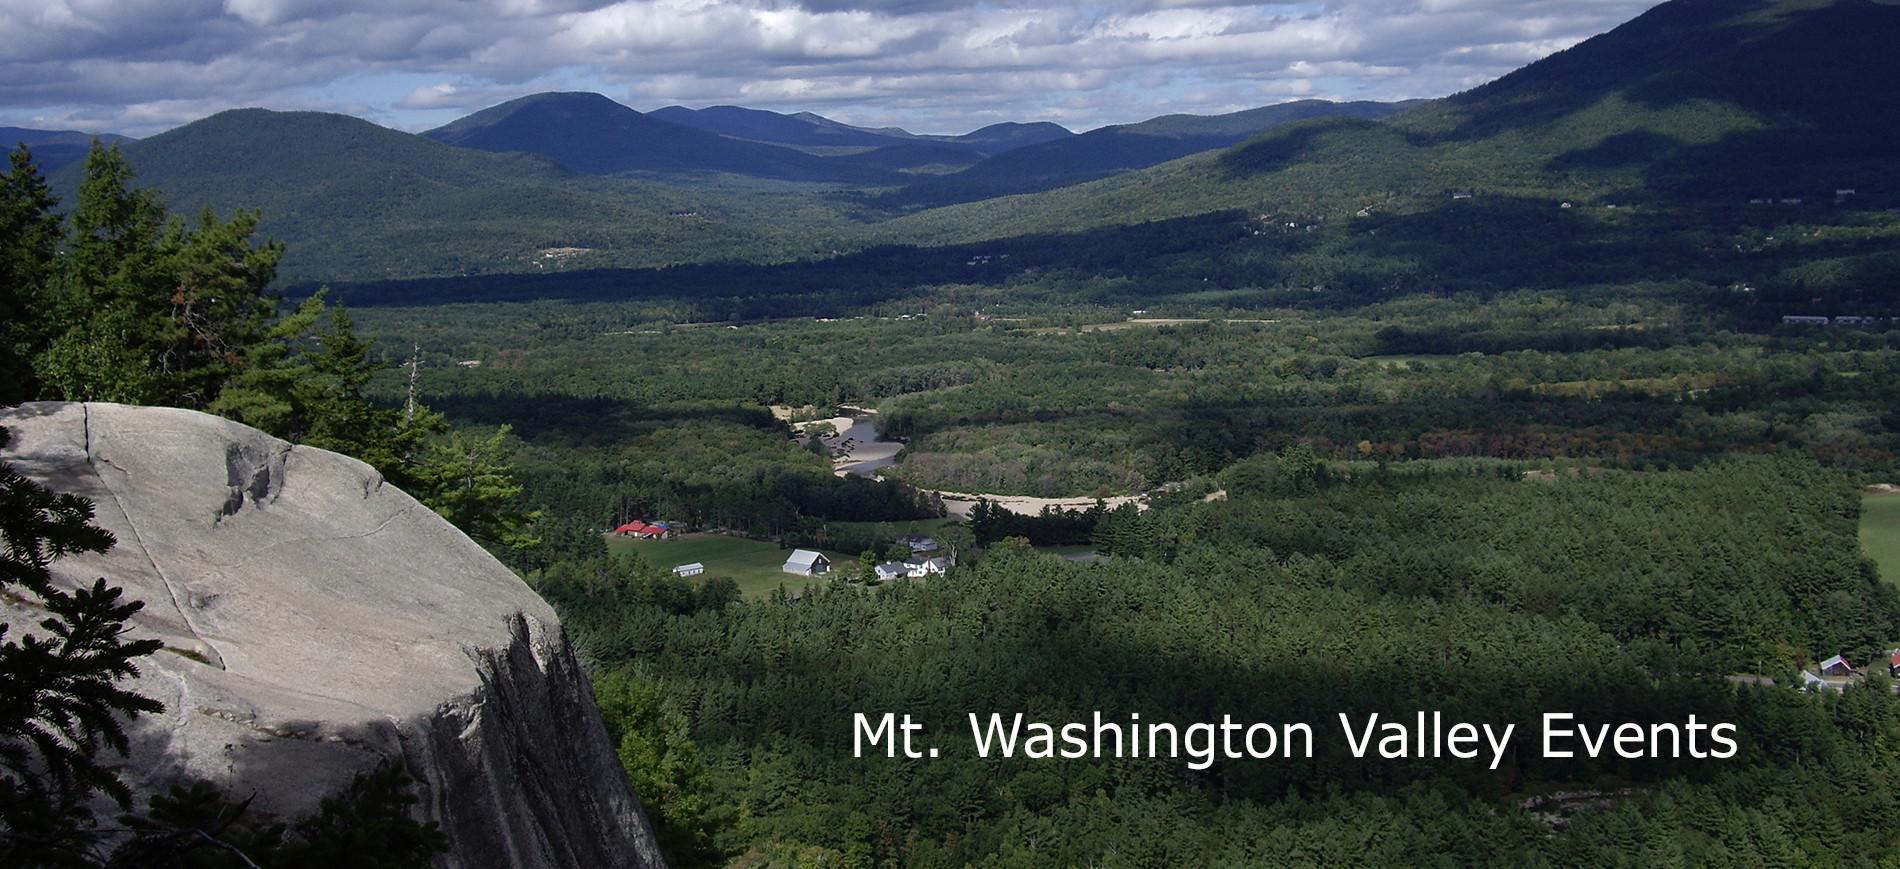 Mount Washington Valley Events